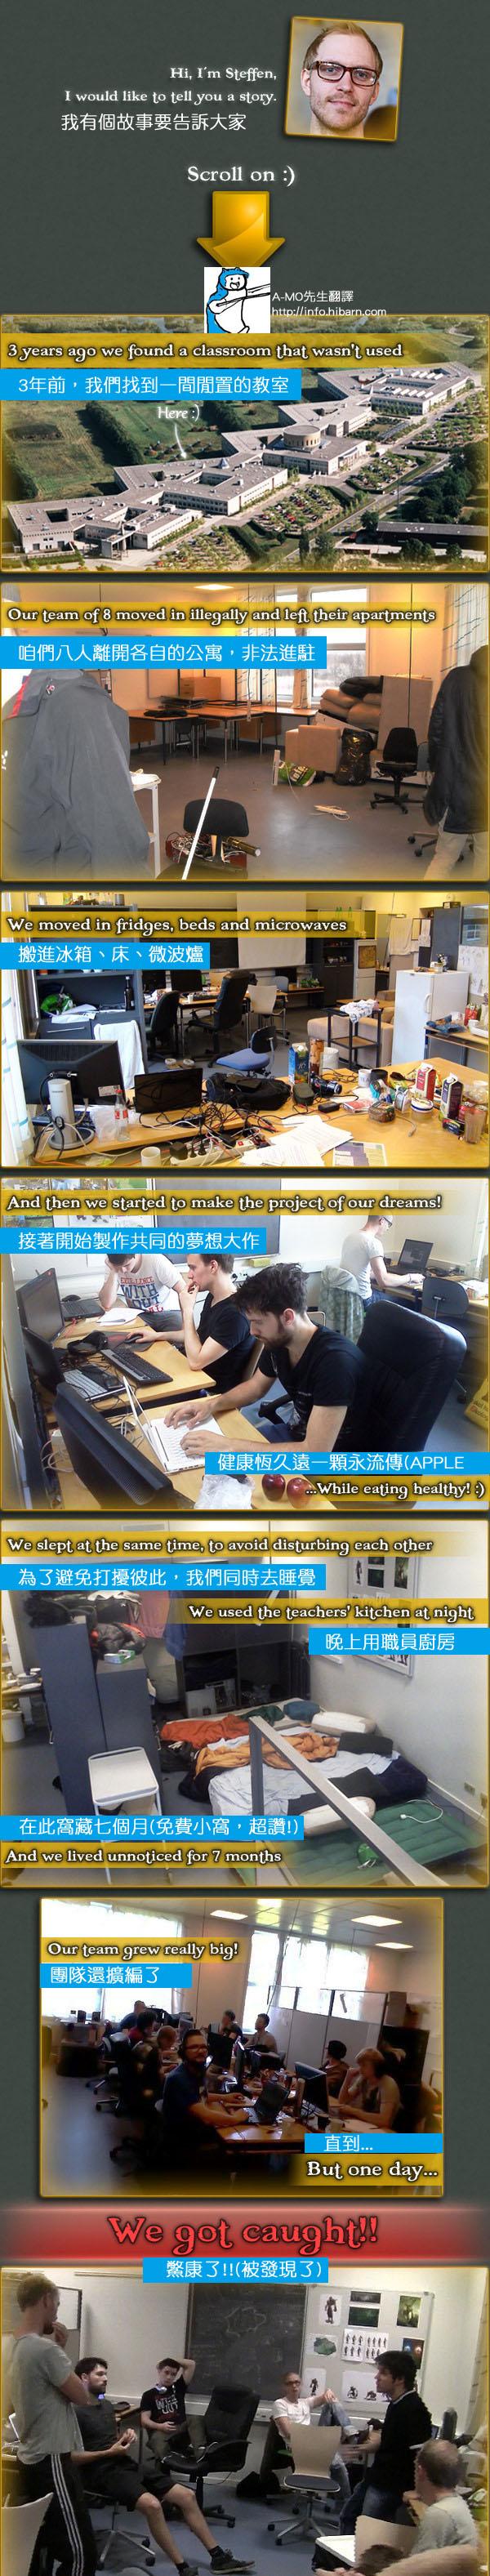 gameworker01